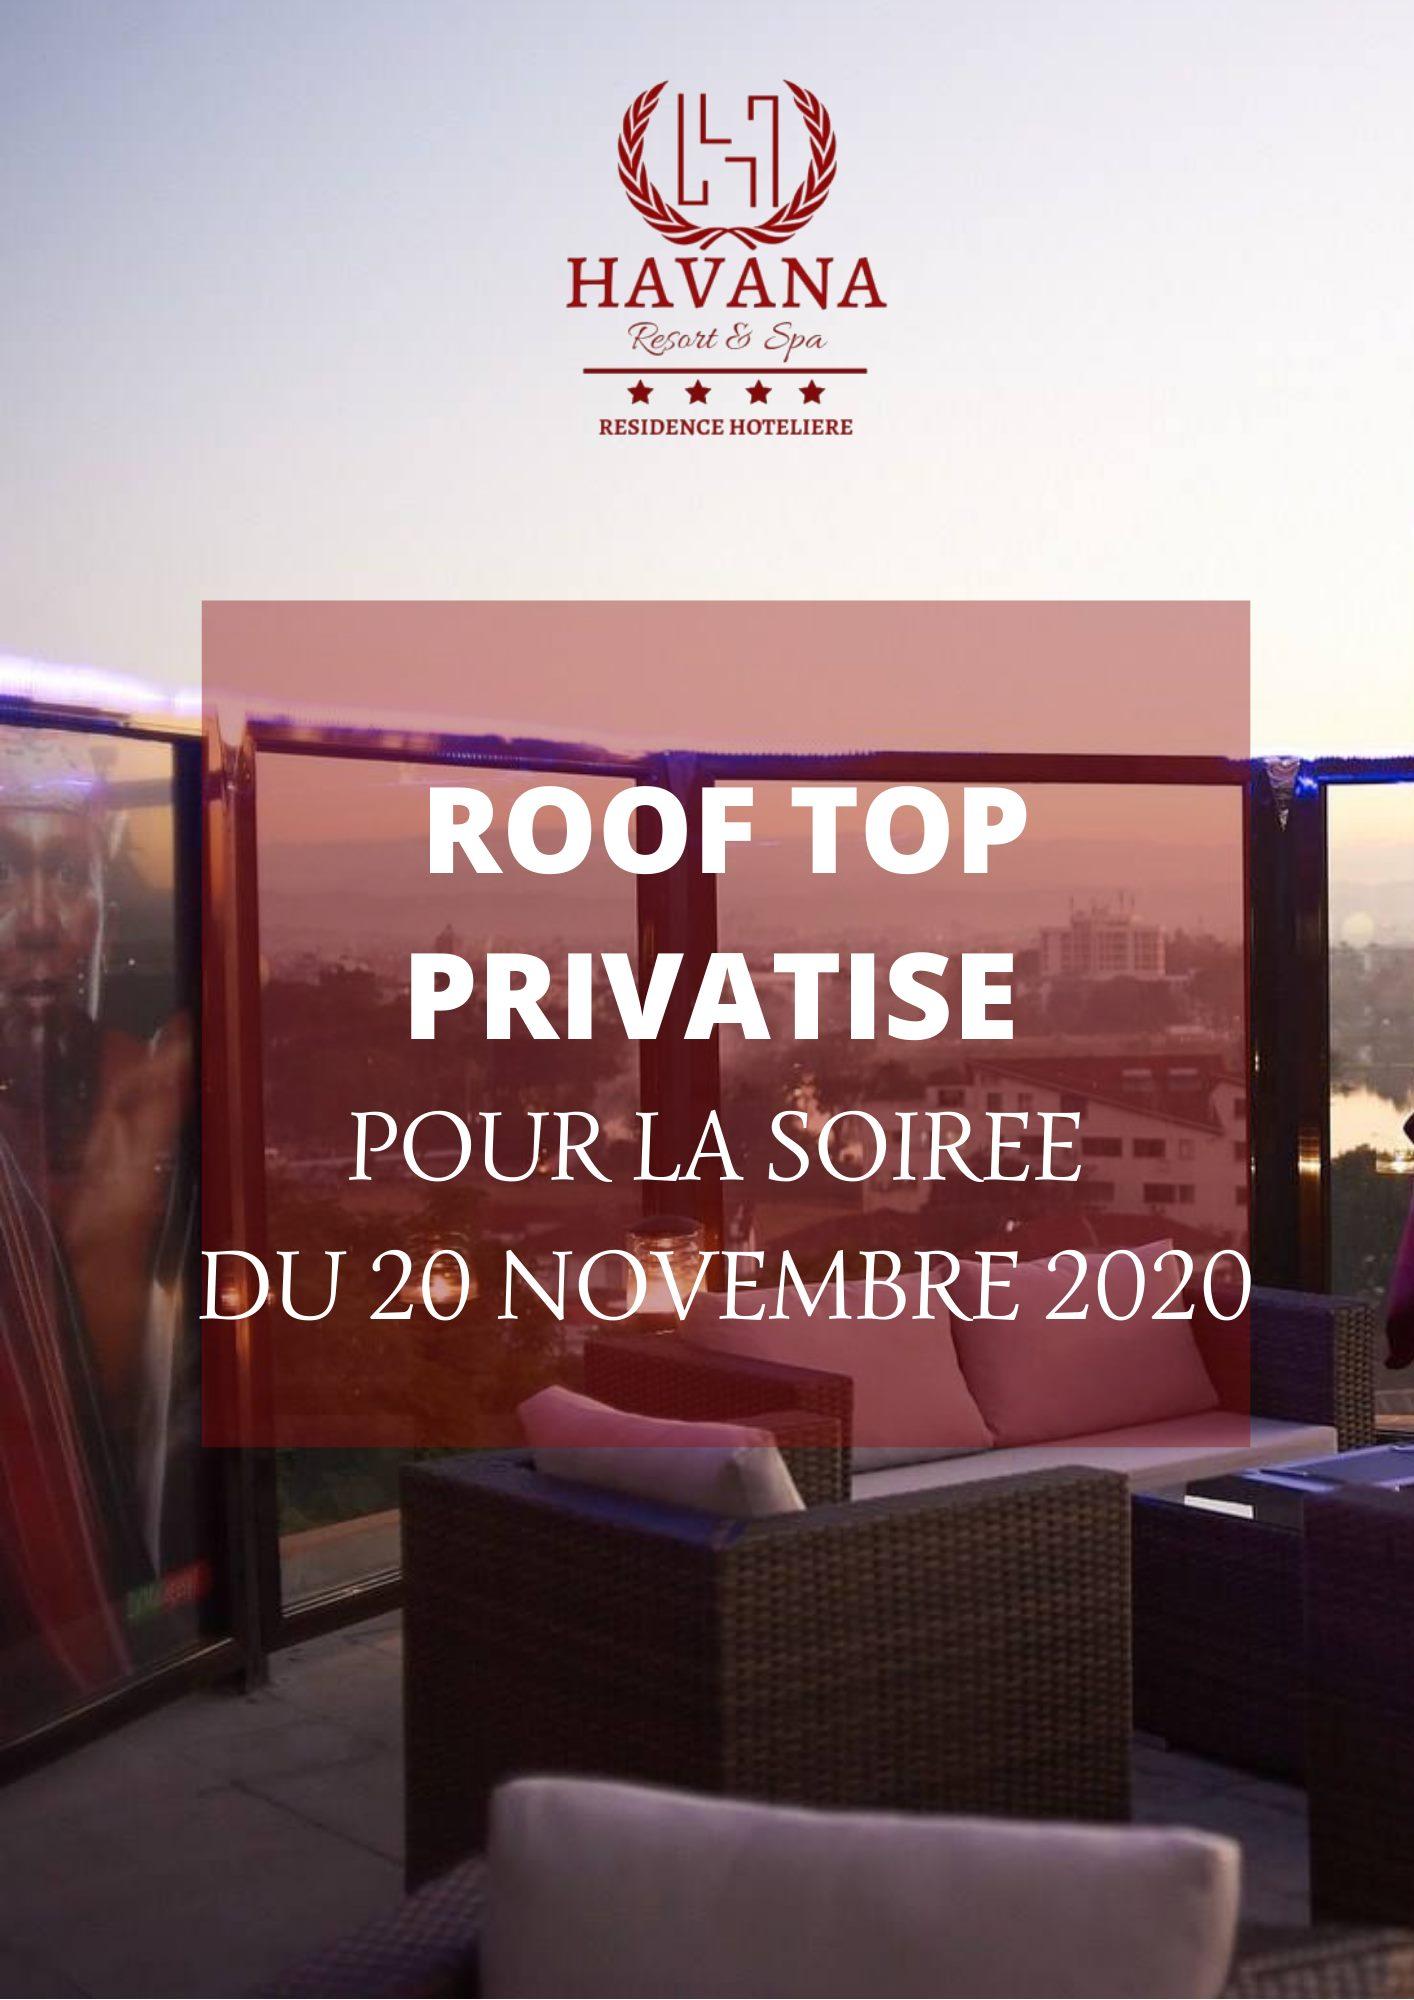 ‼️ ROOF TOP privatisé ‼️